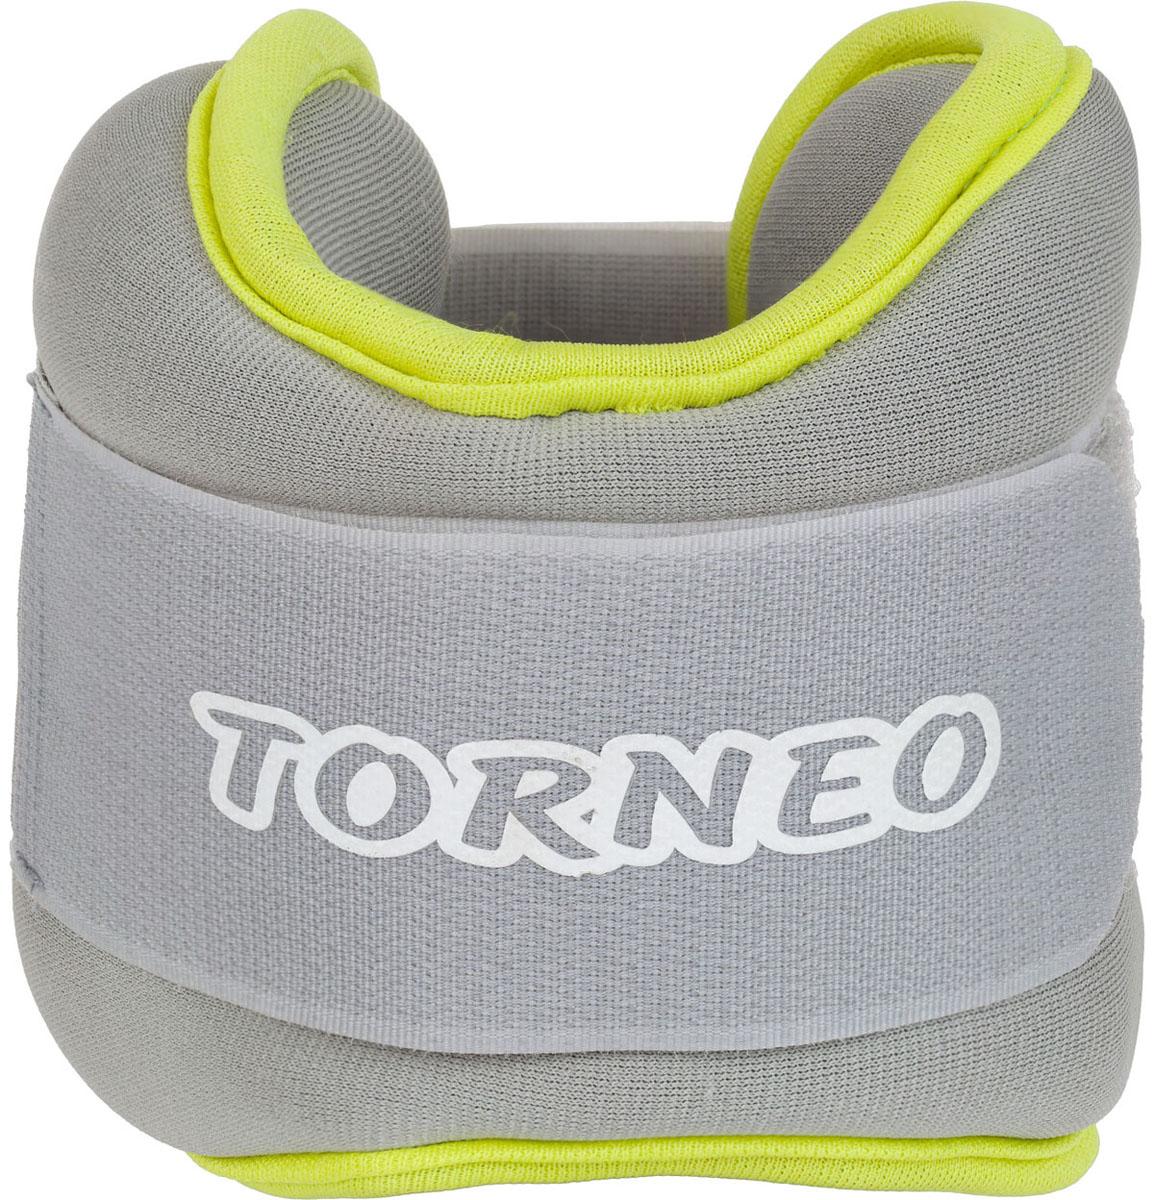 Утяжелители Torneo, цвет: серый, 2 х 1,25 кг